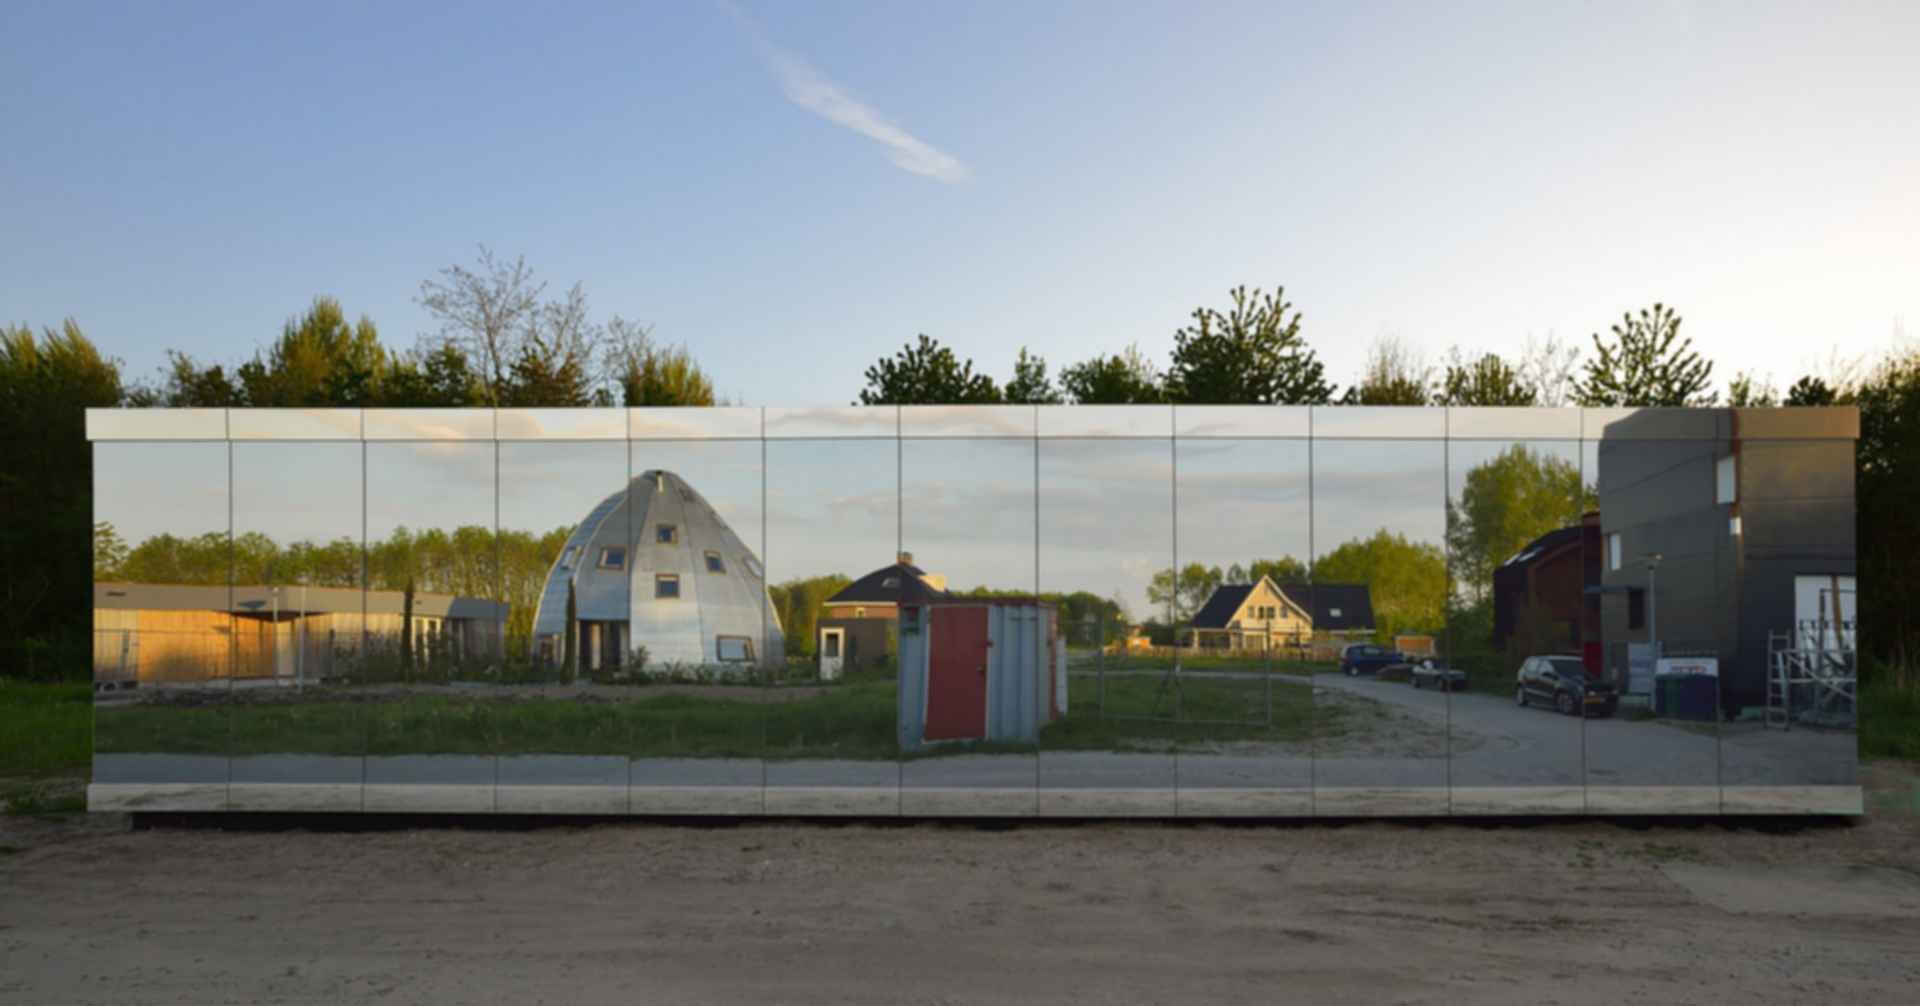 Mirror House, Almere - Exterior